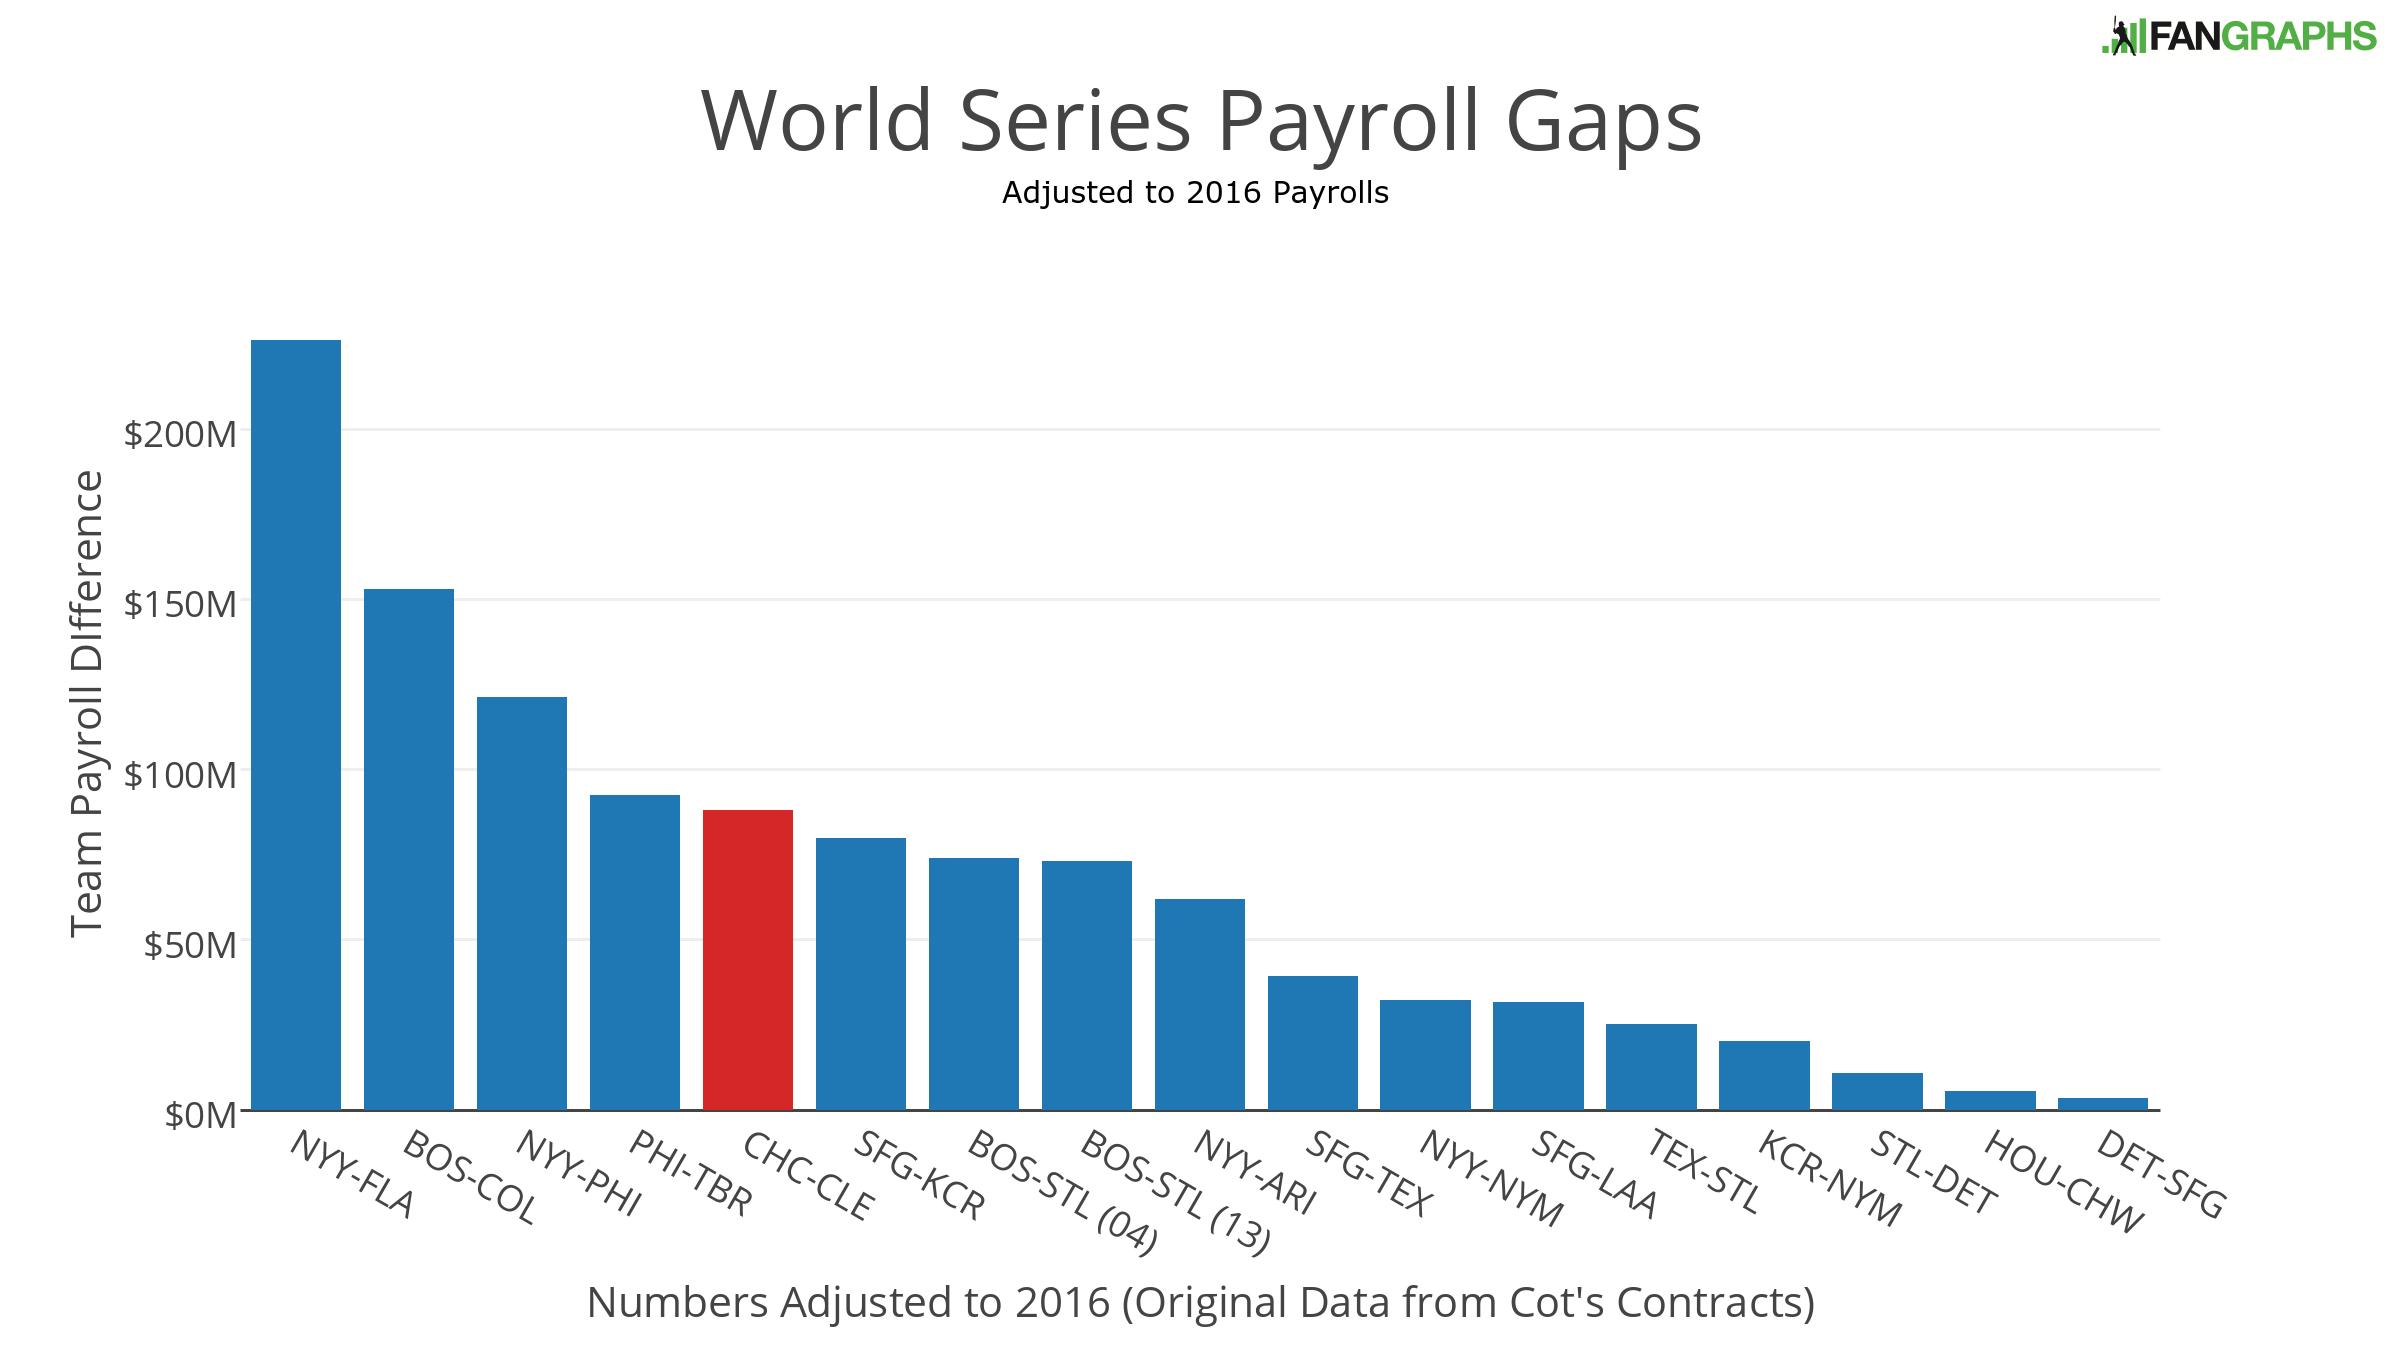 world-series-payroll-gaps-1